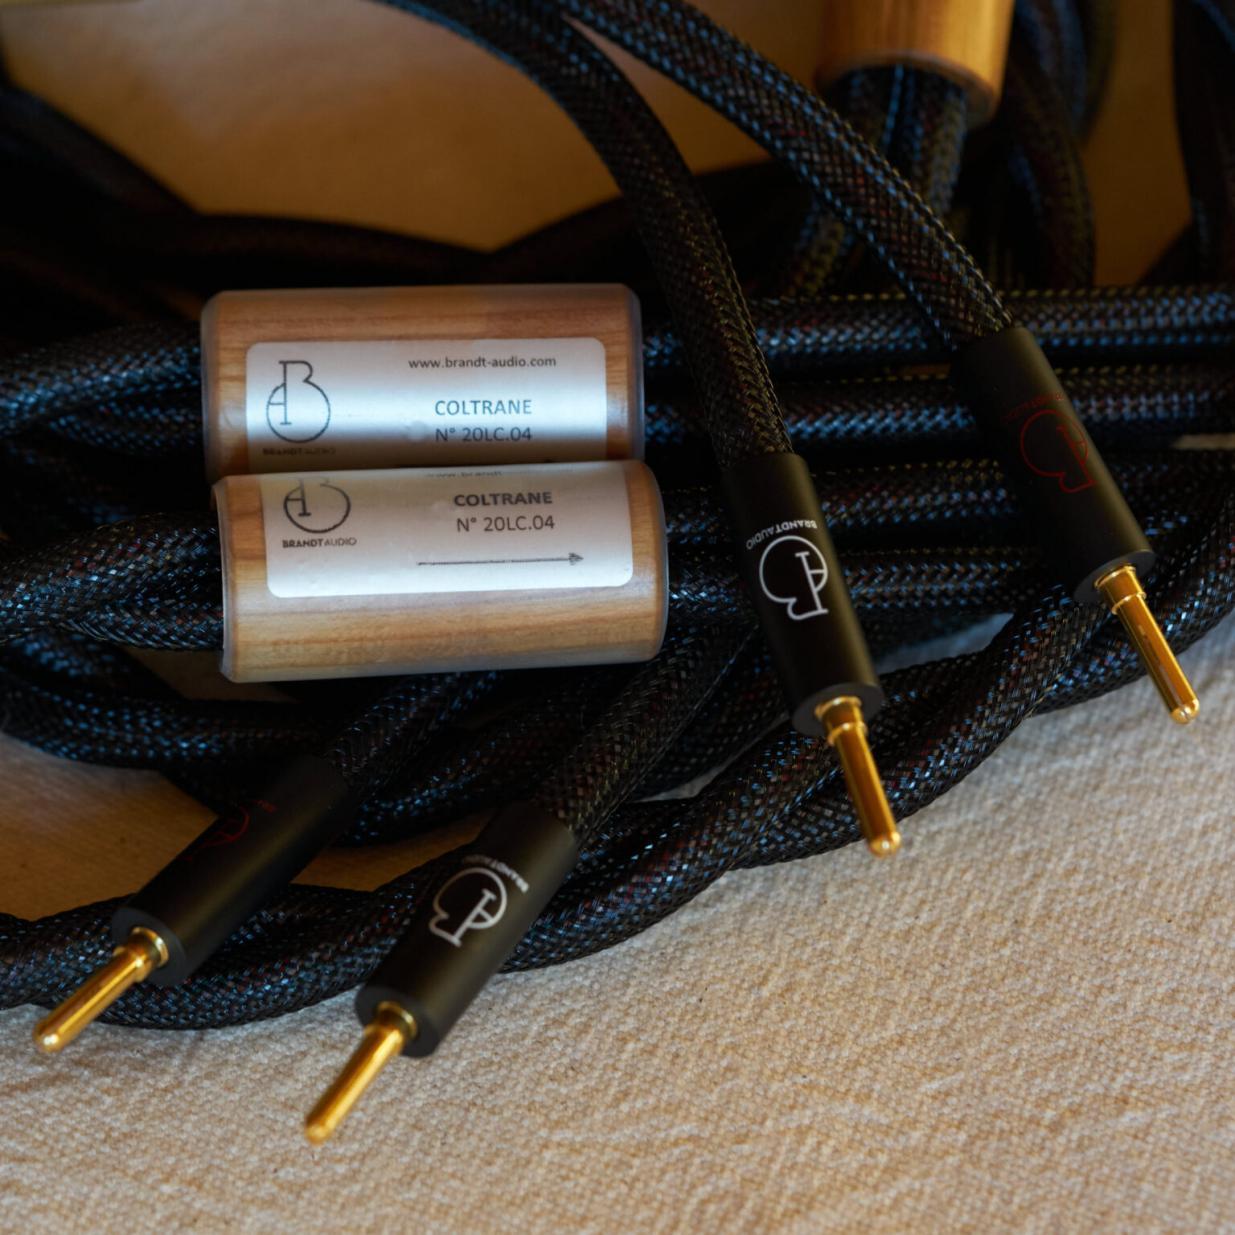 Акустический кабель Brandt Audio Coltrane 3.5m